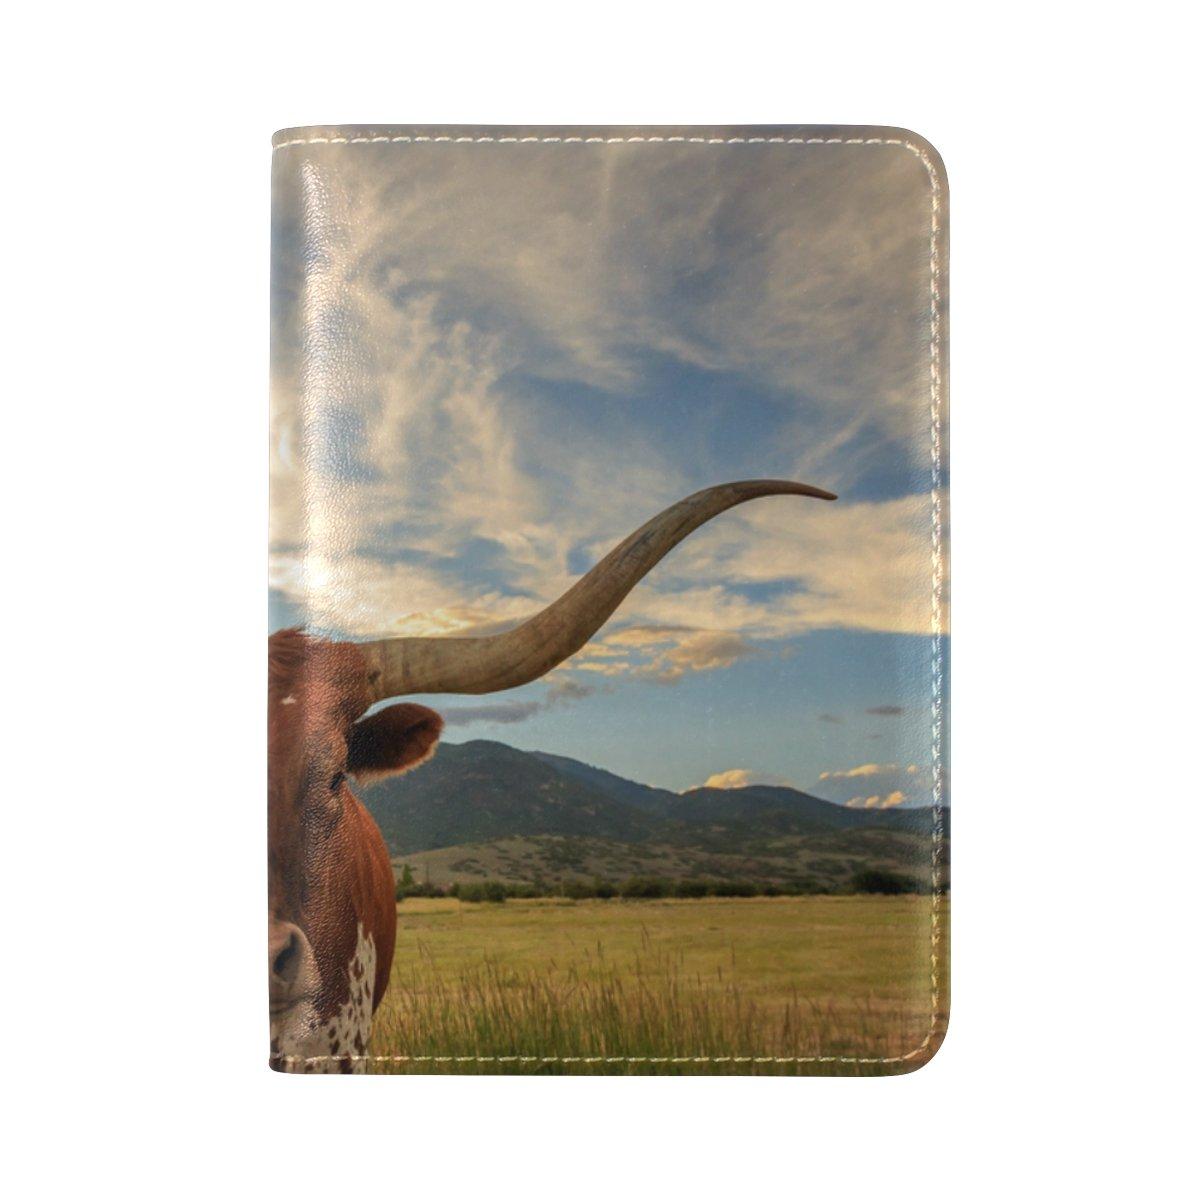 La Random Texas Longhorn Steer Passport Holder Cover Leather Travel Passport Wallet Case